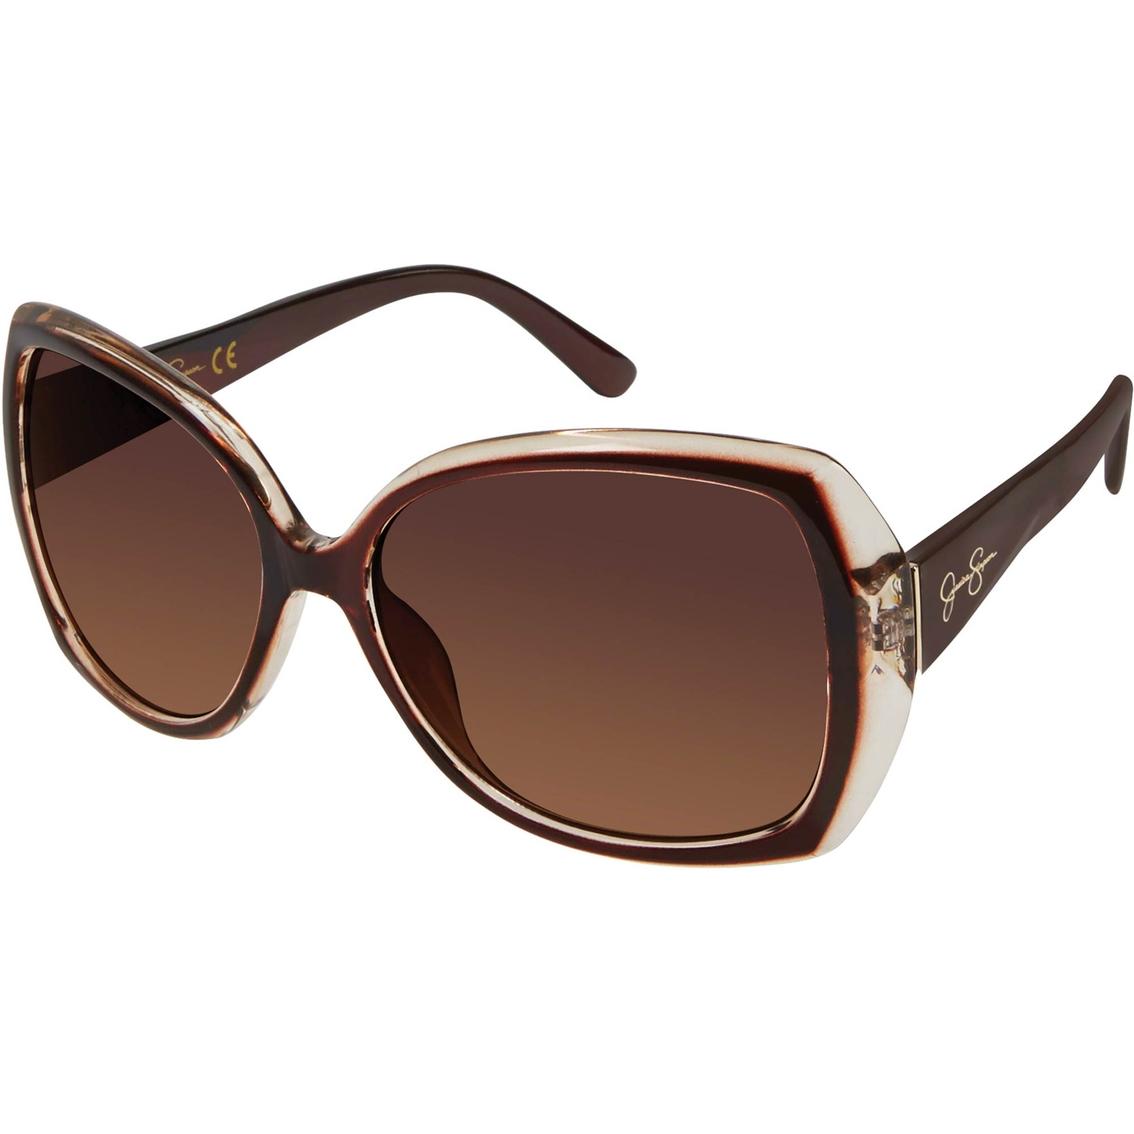 5b4014106b7 Jessica Simpson Oversize Cut Crystal Plastic Sunglasses